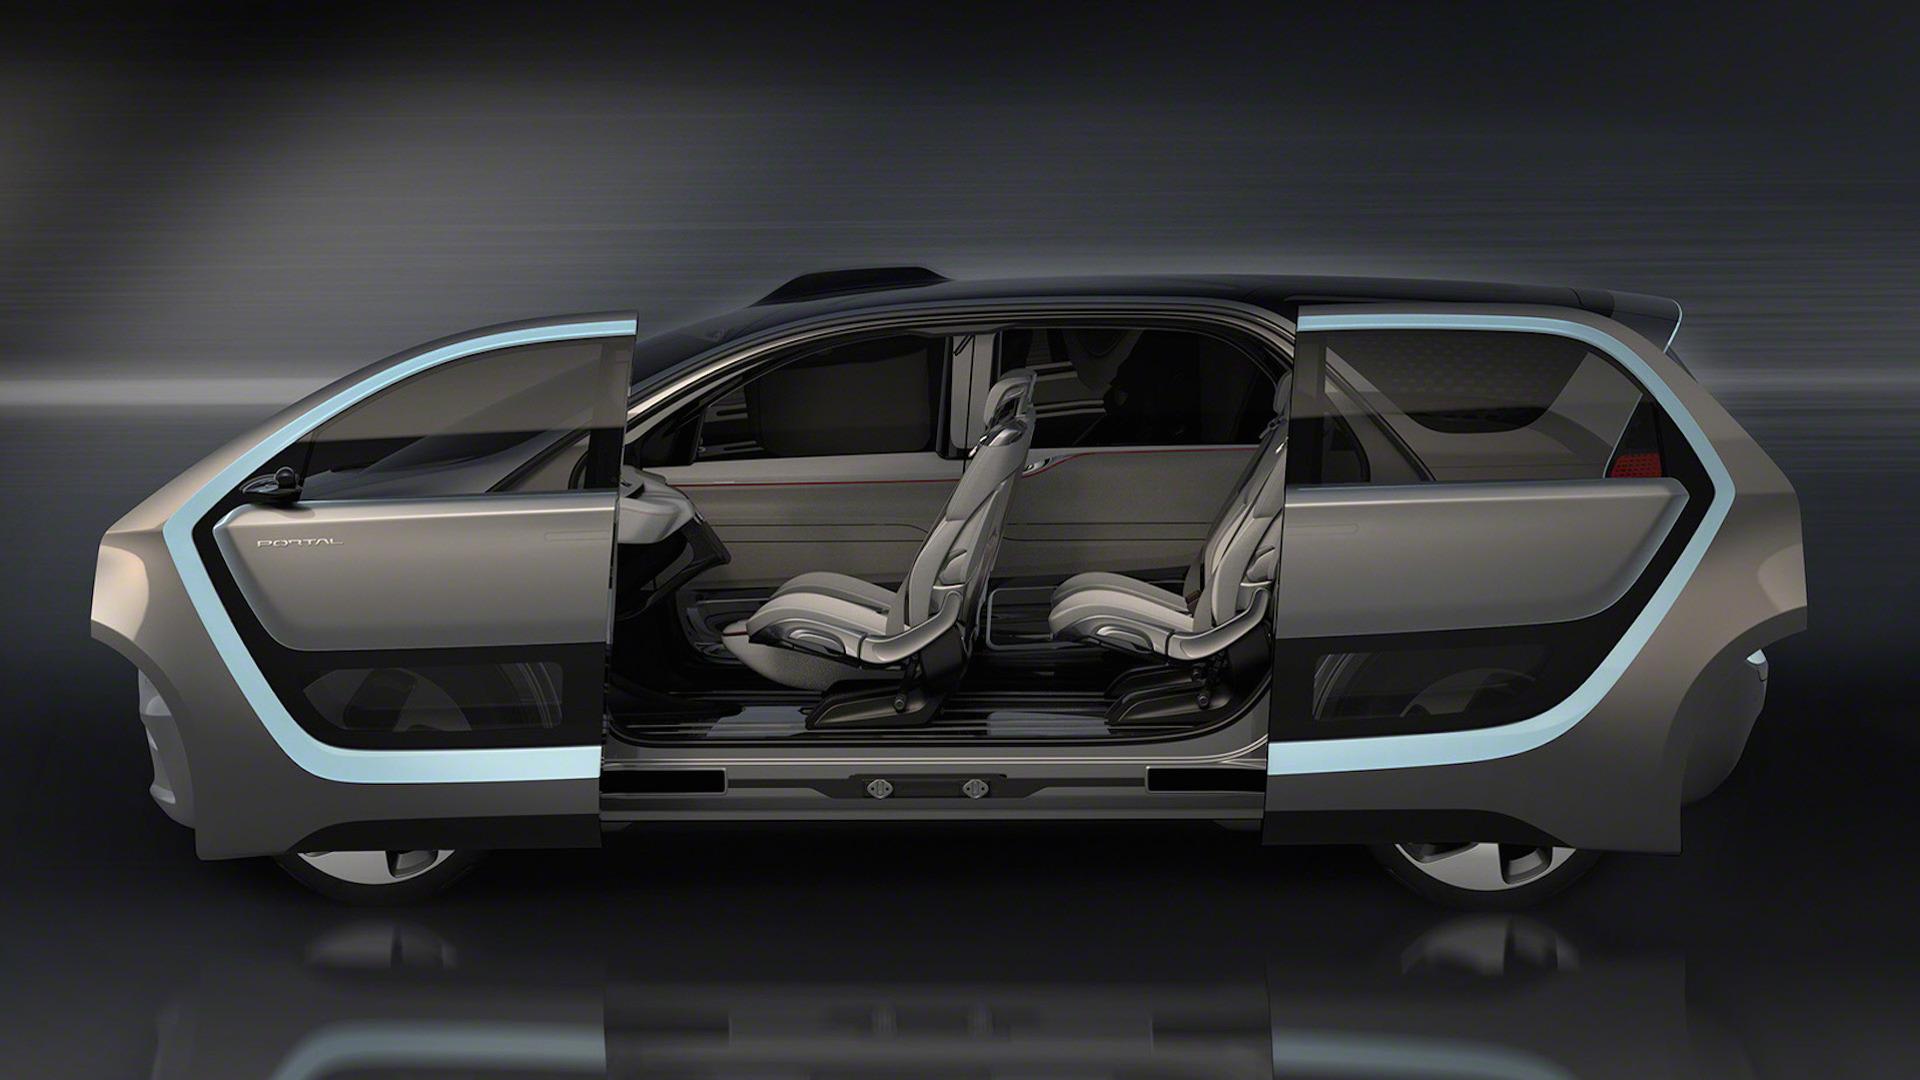 Photo of Με αναγνώριση προσώπων το Chrysler Portal